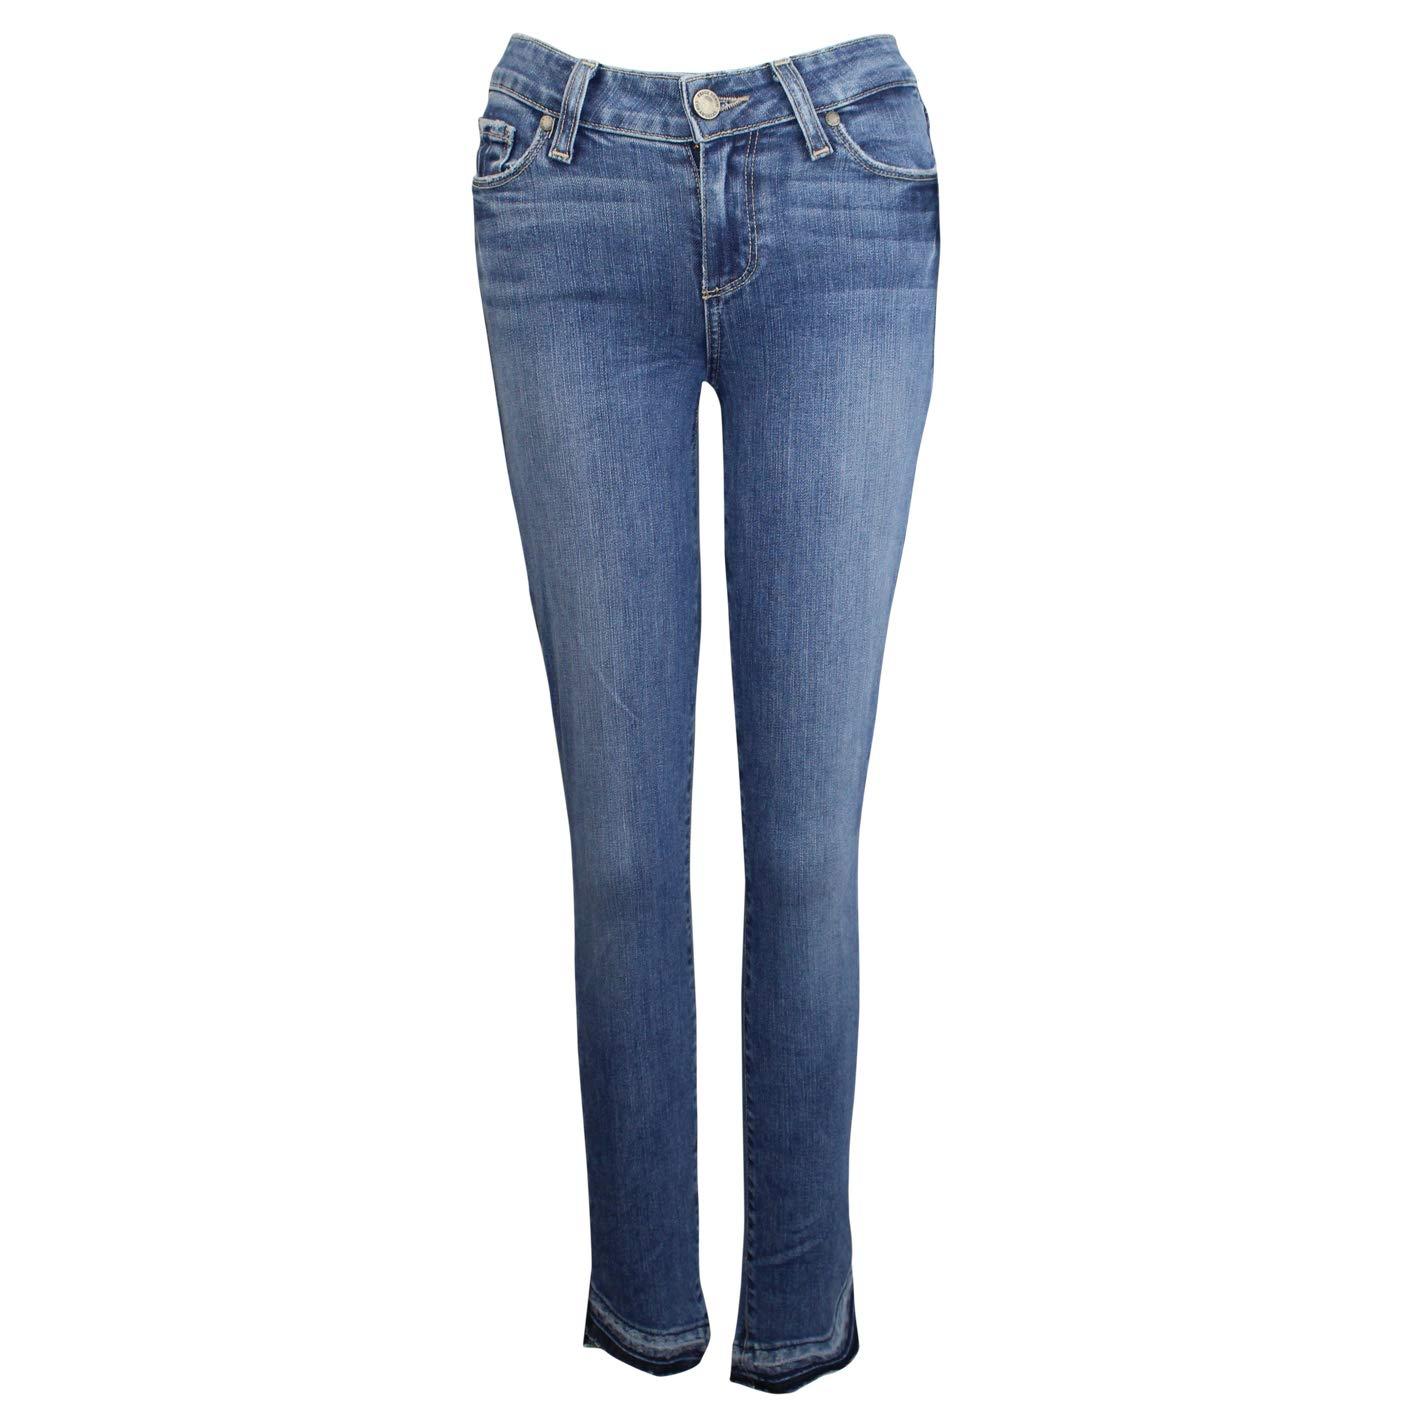 Paige Denim Womens Verdugo Ankle Skinny Jean  Zeke Zeke 25, 26, 27, 28, 29, 30, 31